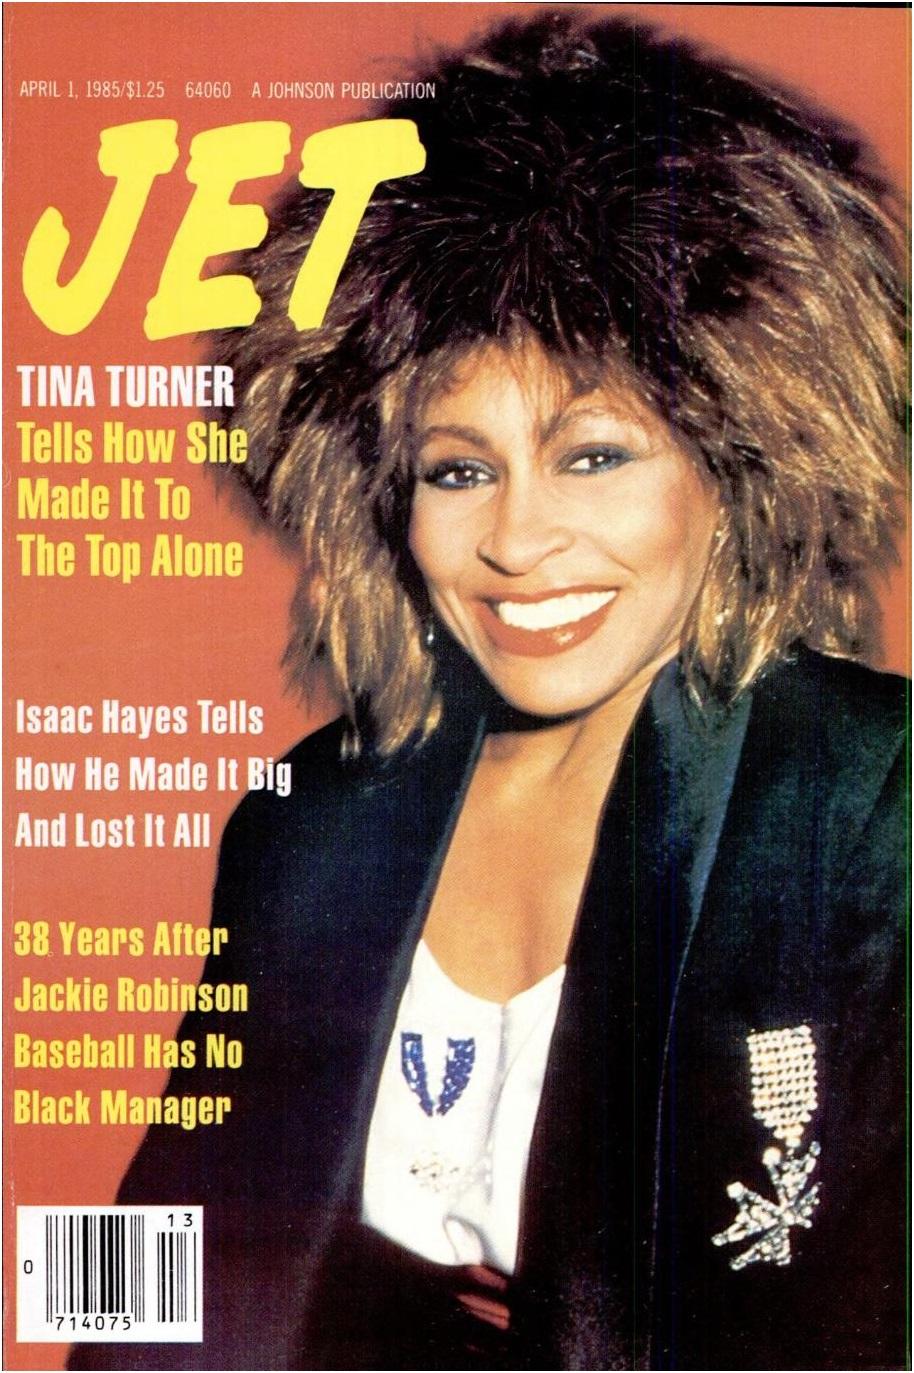 Tina Turner 80s